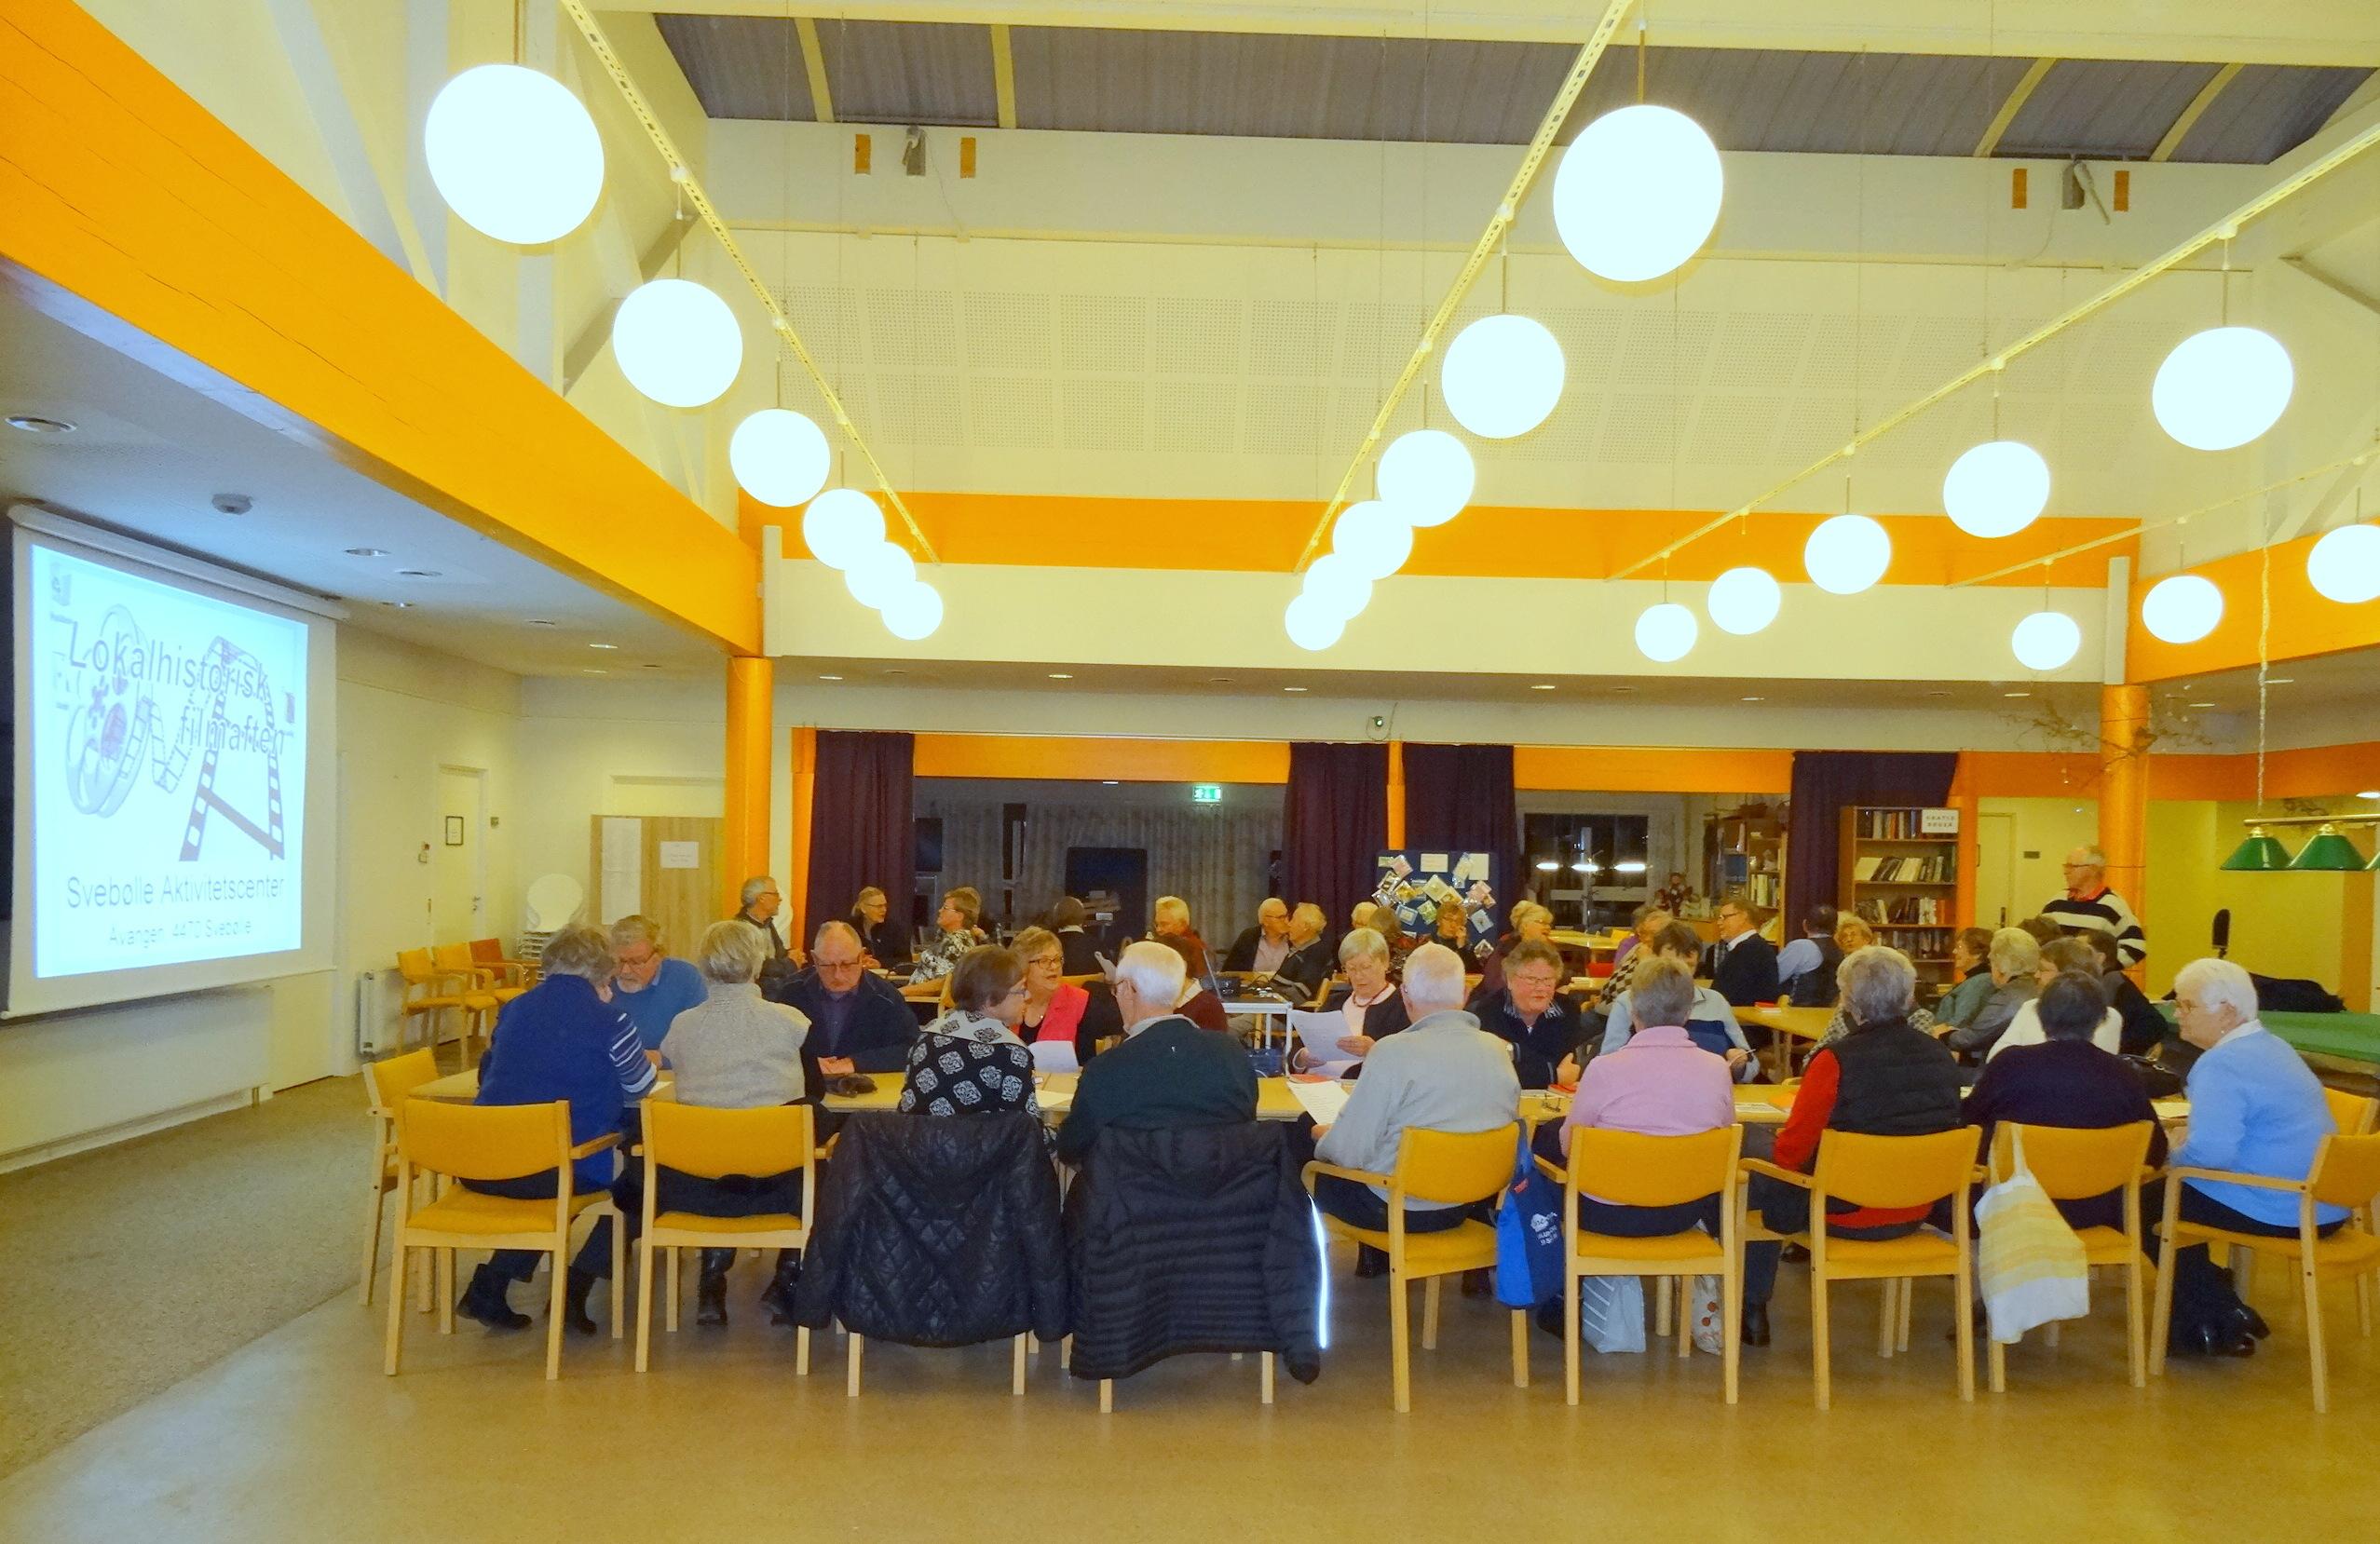 Lokalhistorisk filmaften i Svebølle Aktivitetscenter